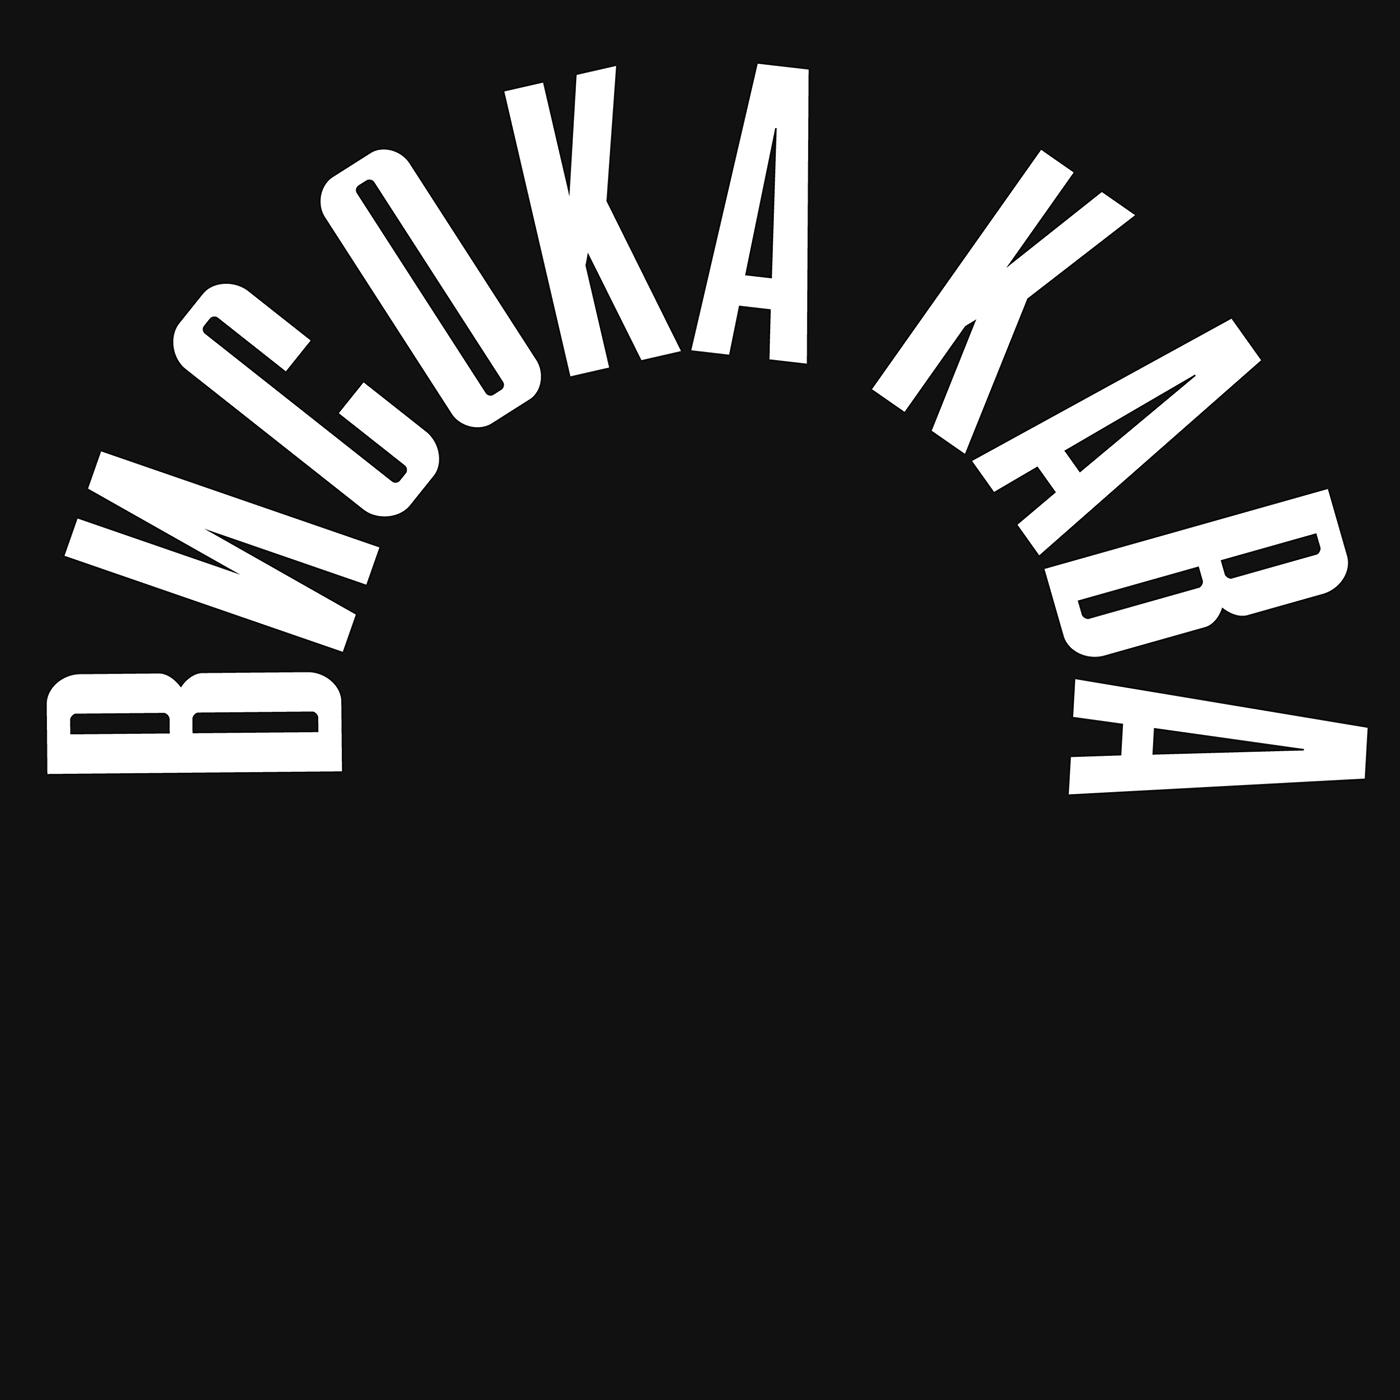 Висока Кава logo